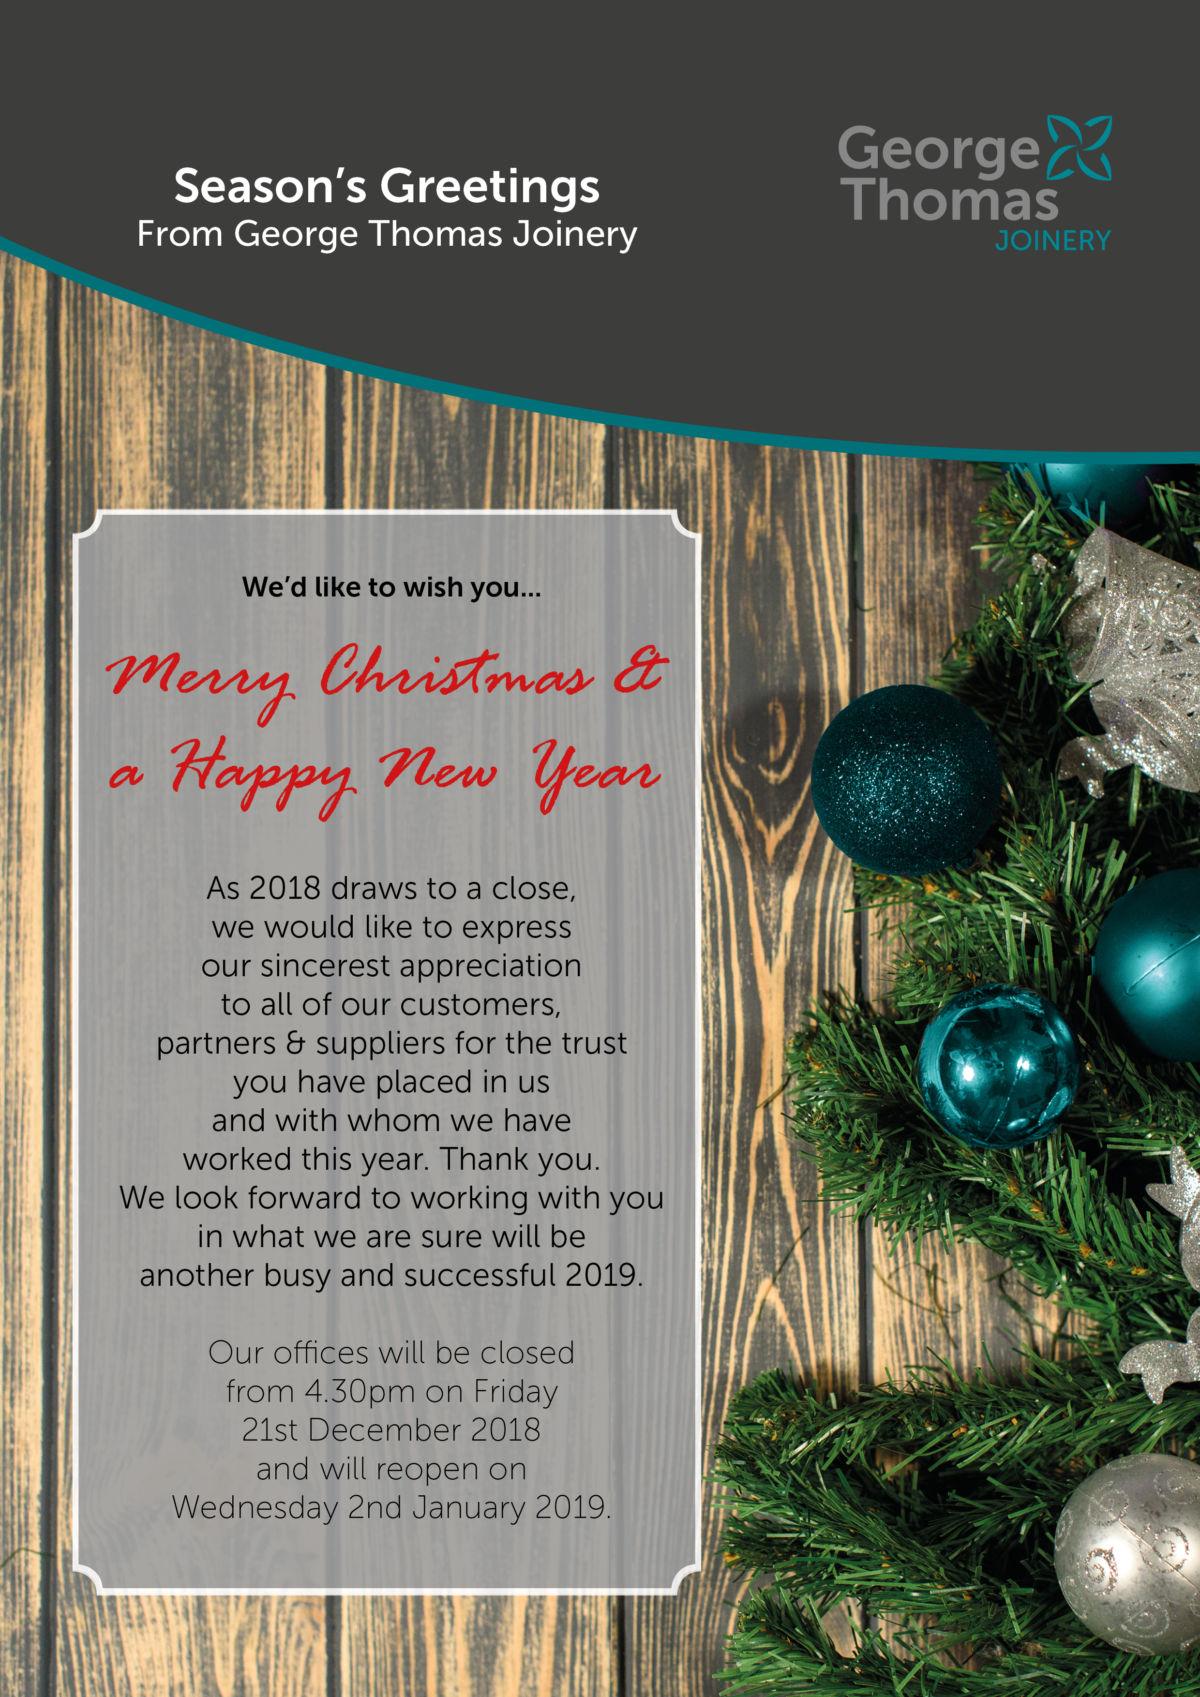 George Thomas Christmas 2018 message